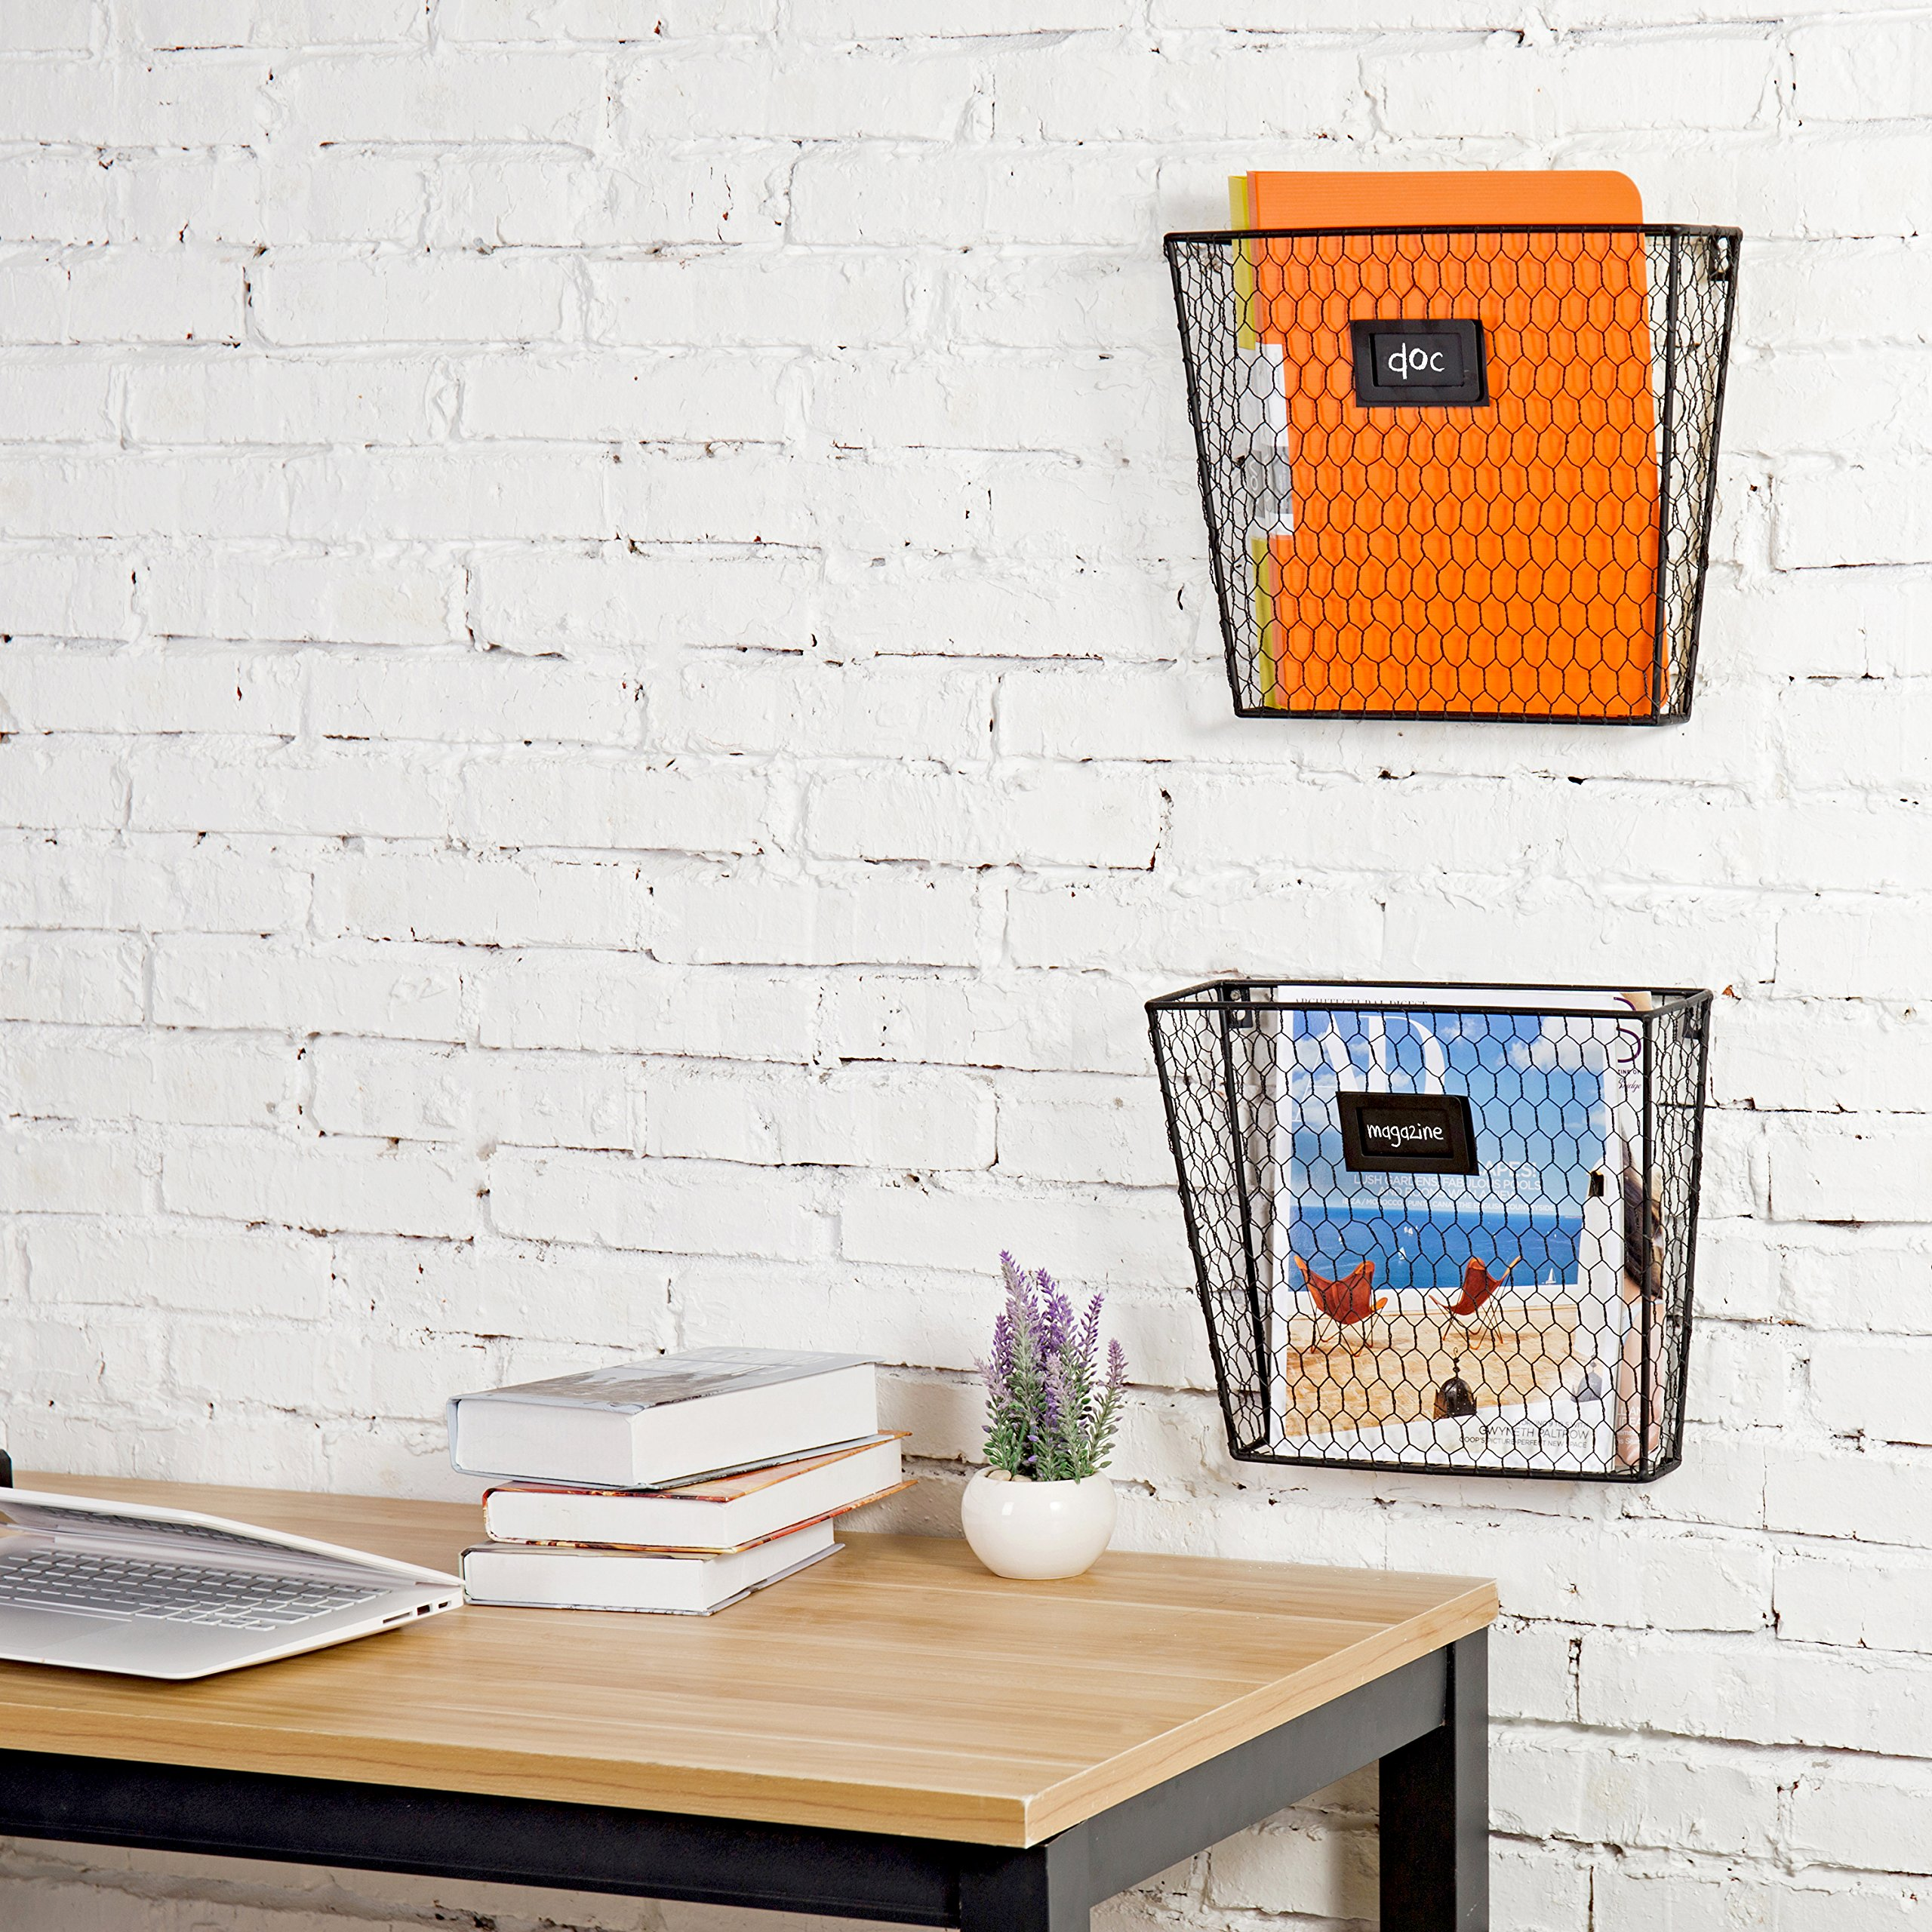 MyGift Rustic Chicken Wire Wall-Mounted Magazine & File Folder Baskets w/Chalkboard Label Inserts, Set of 2 by MyGift (Image #6)